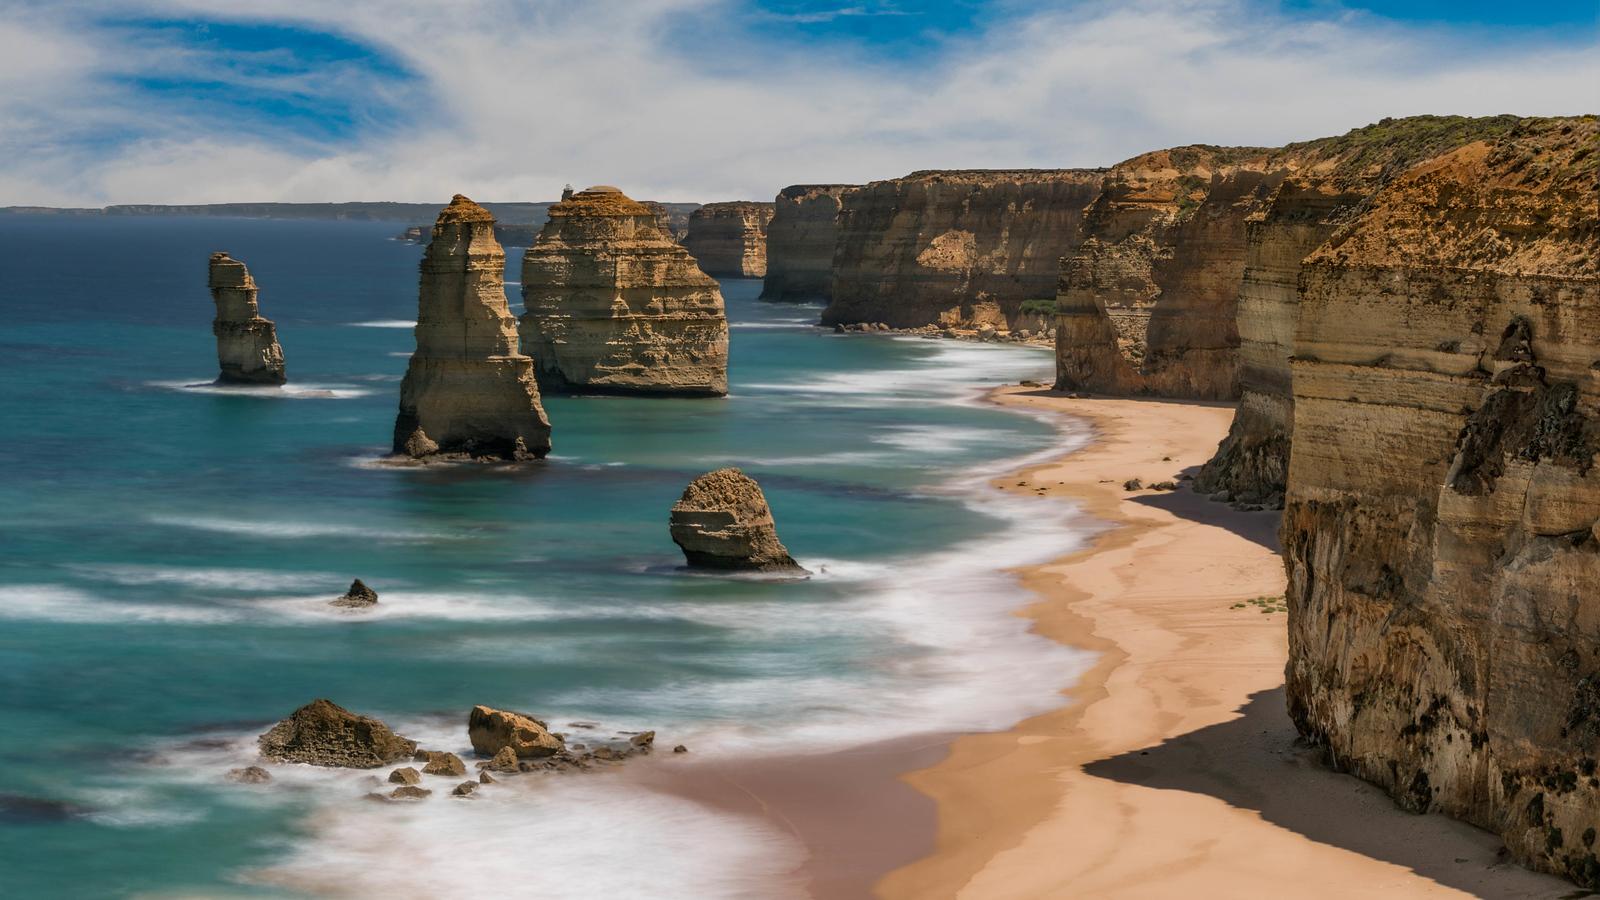 The 12 Apostles in Victoria, Australia